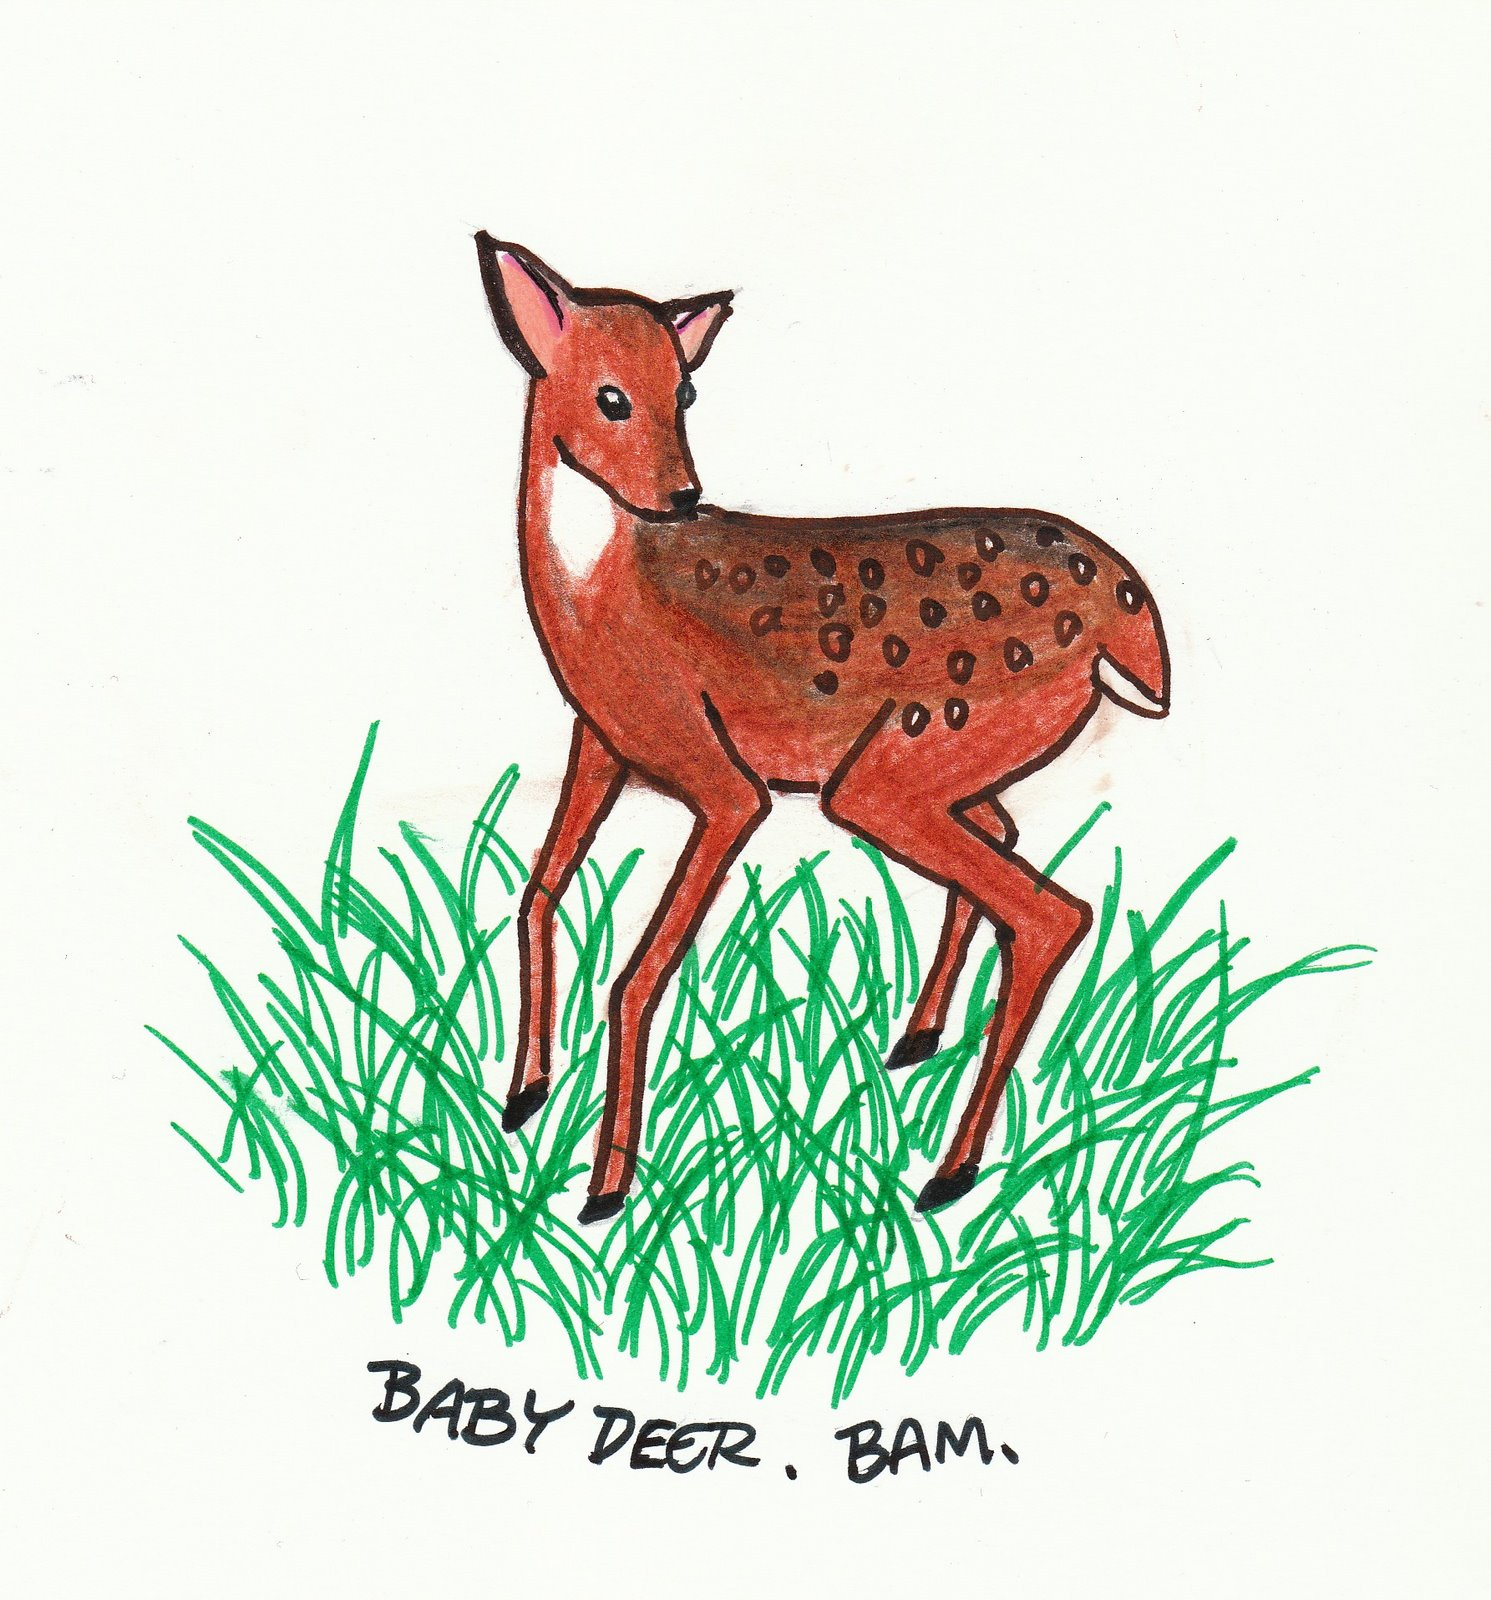 [Bambi?]